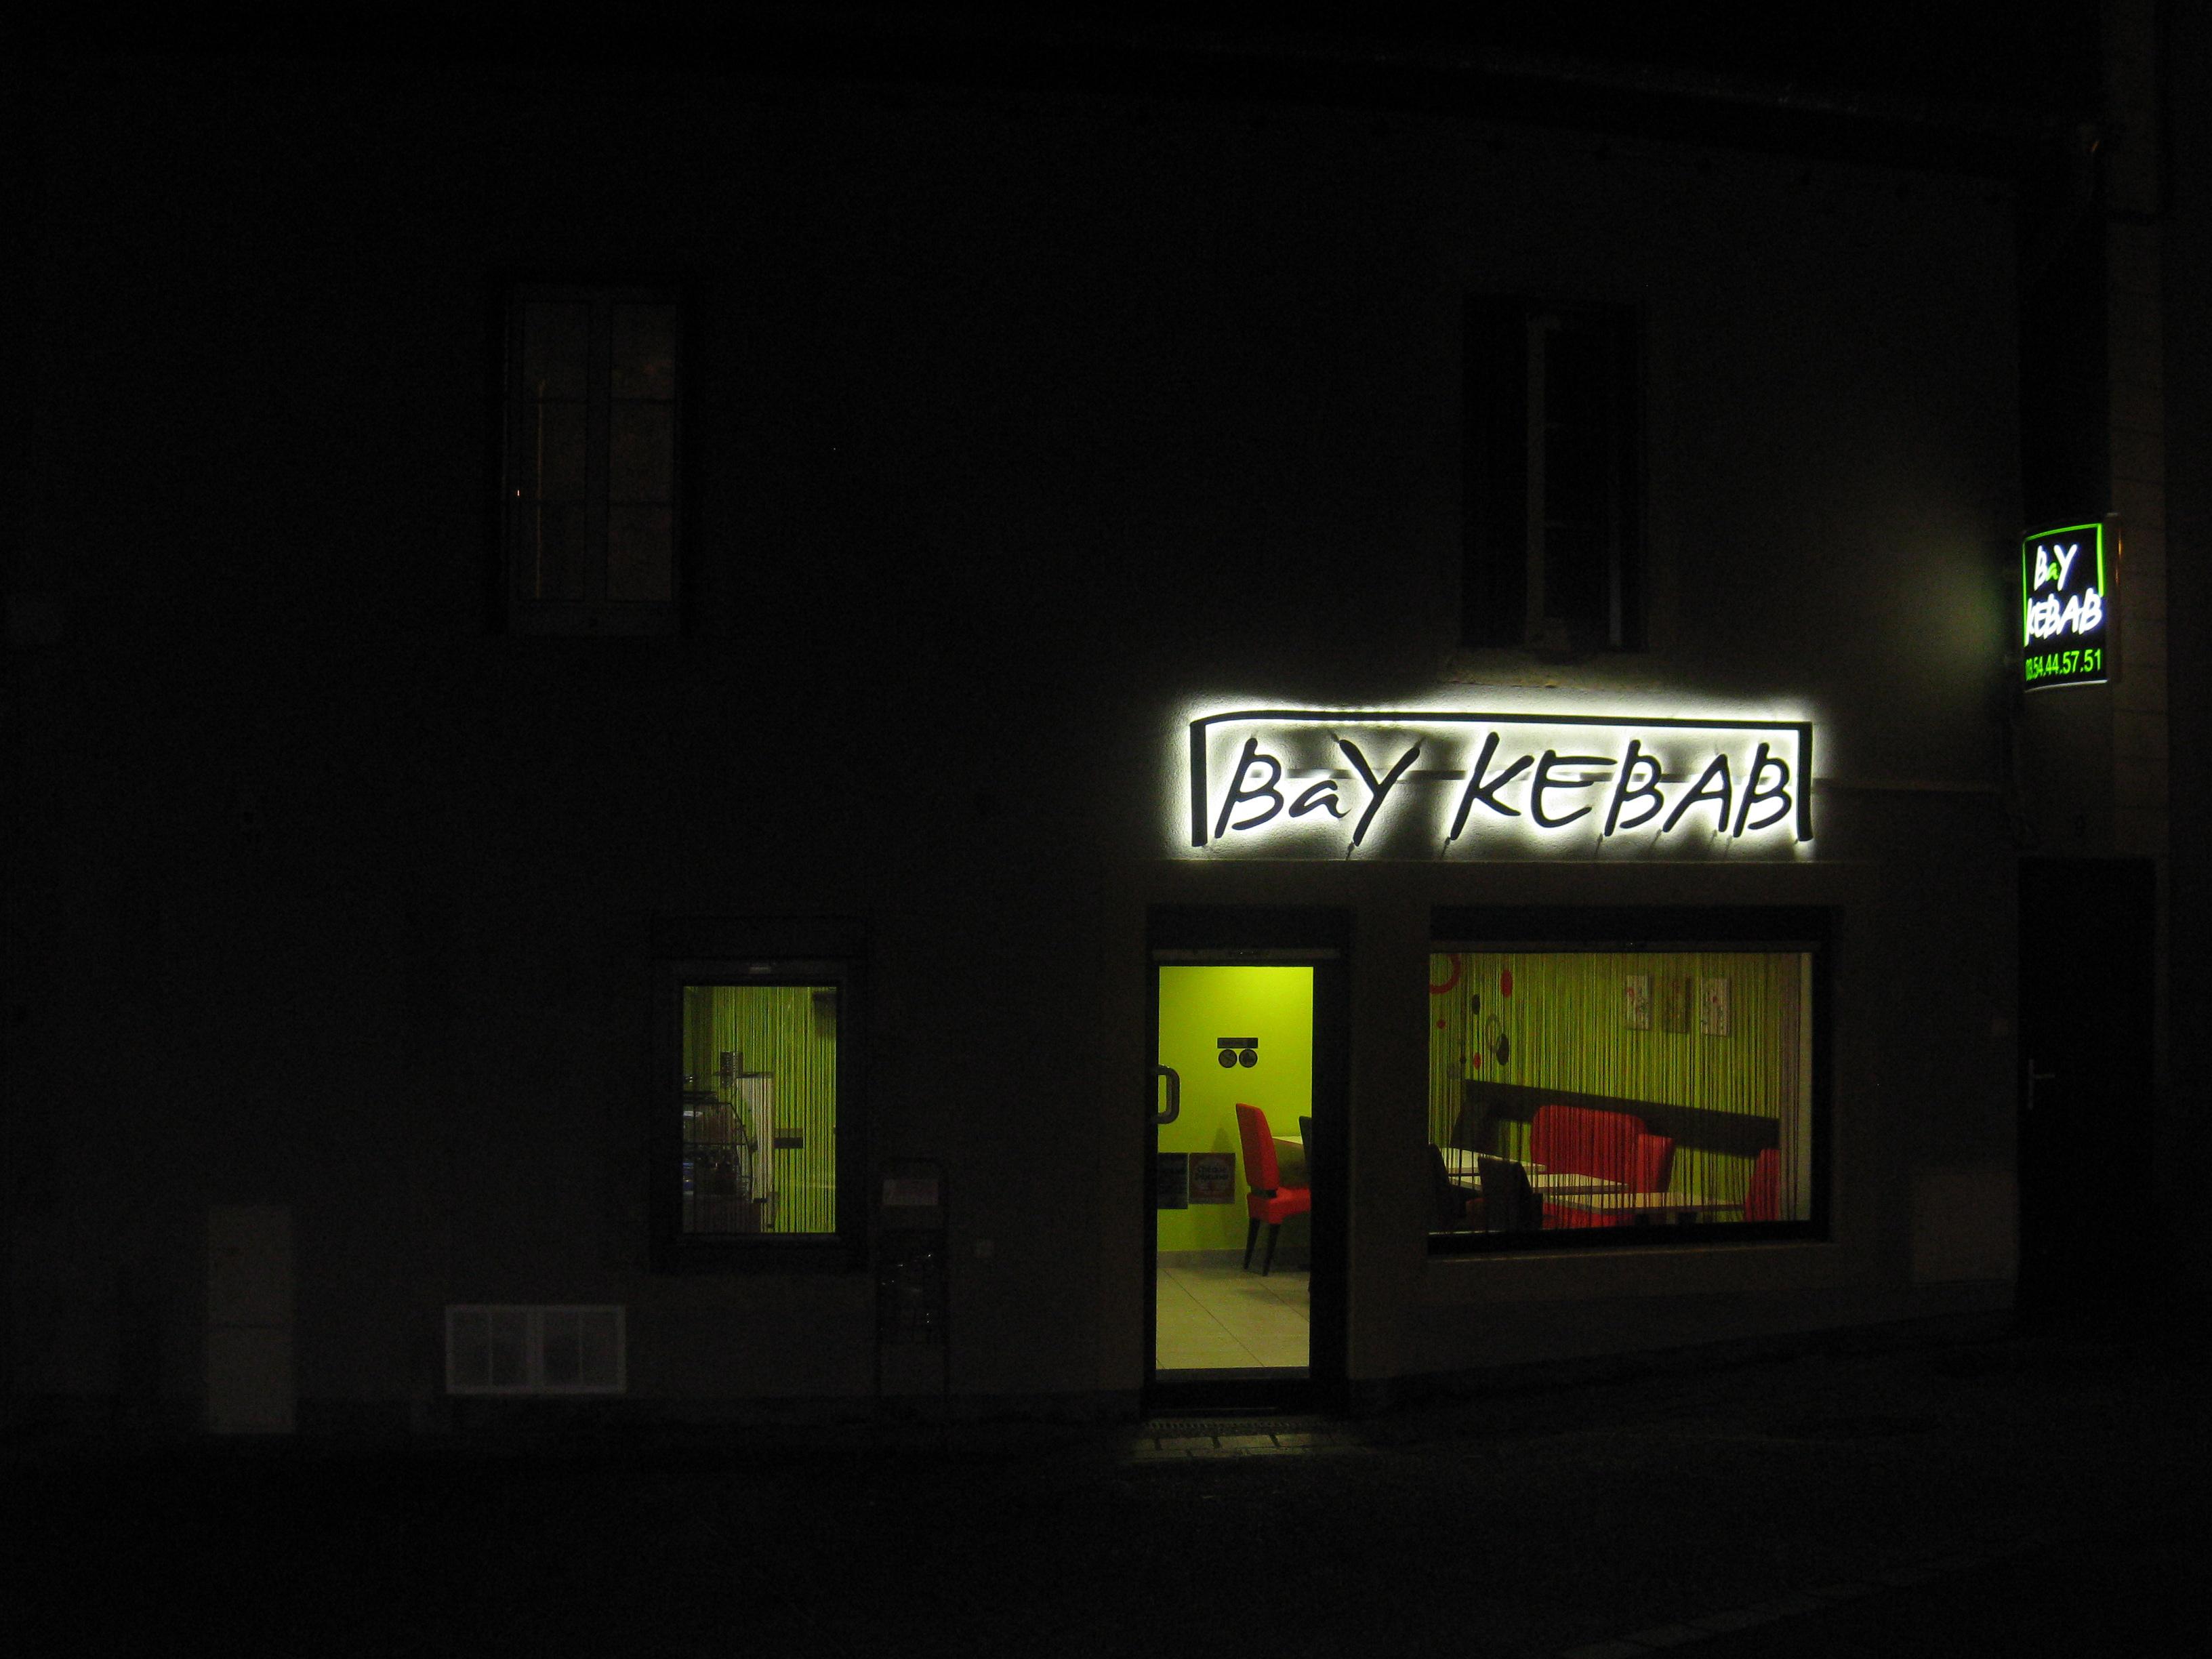 Bay kebab